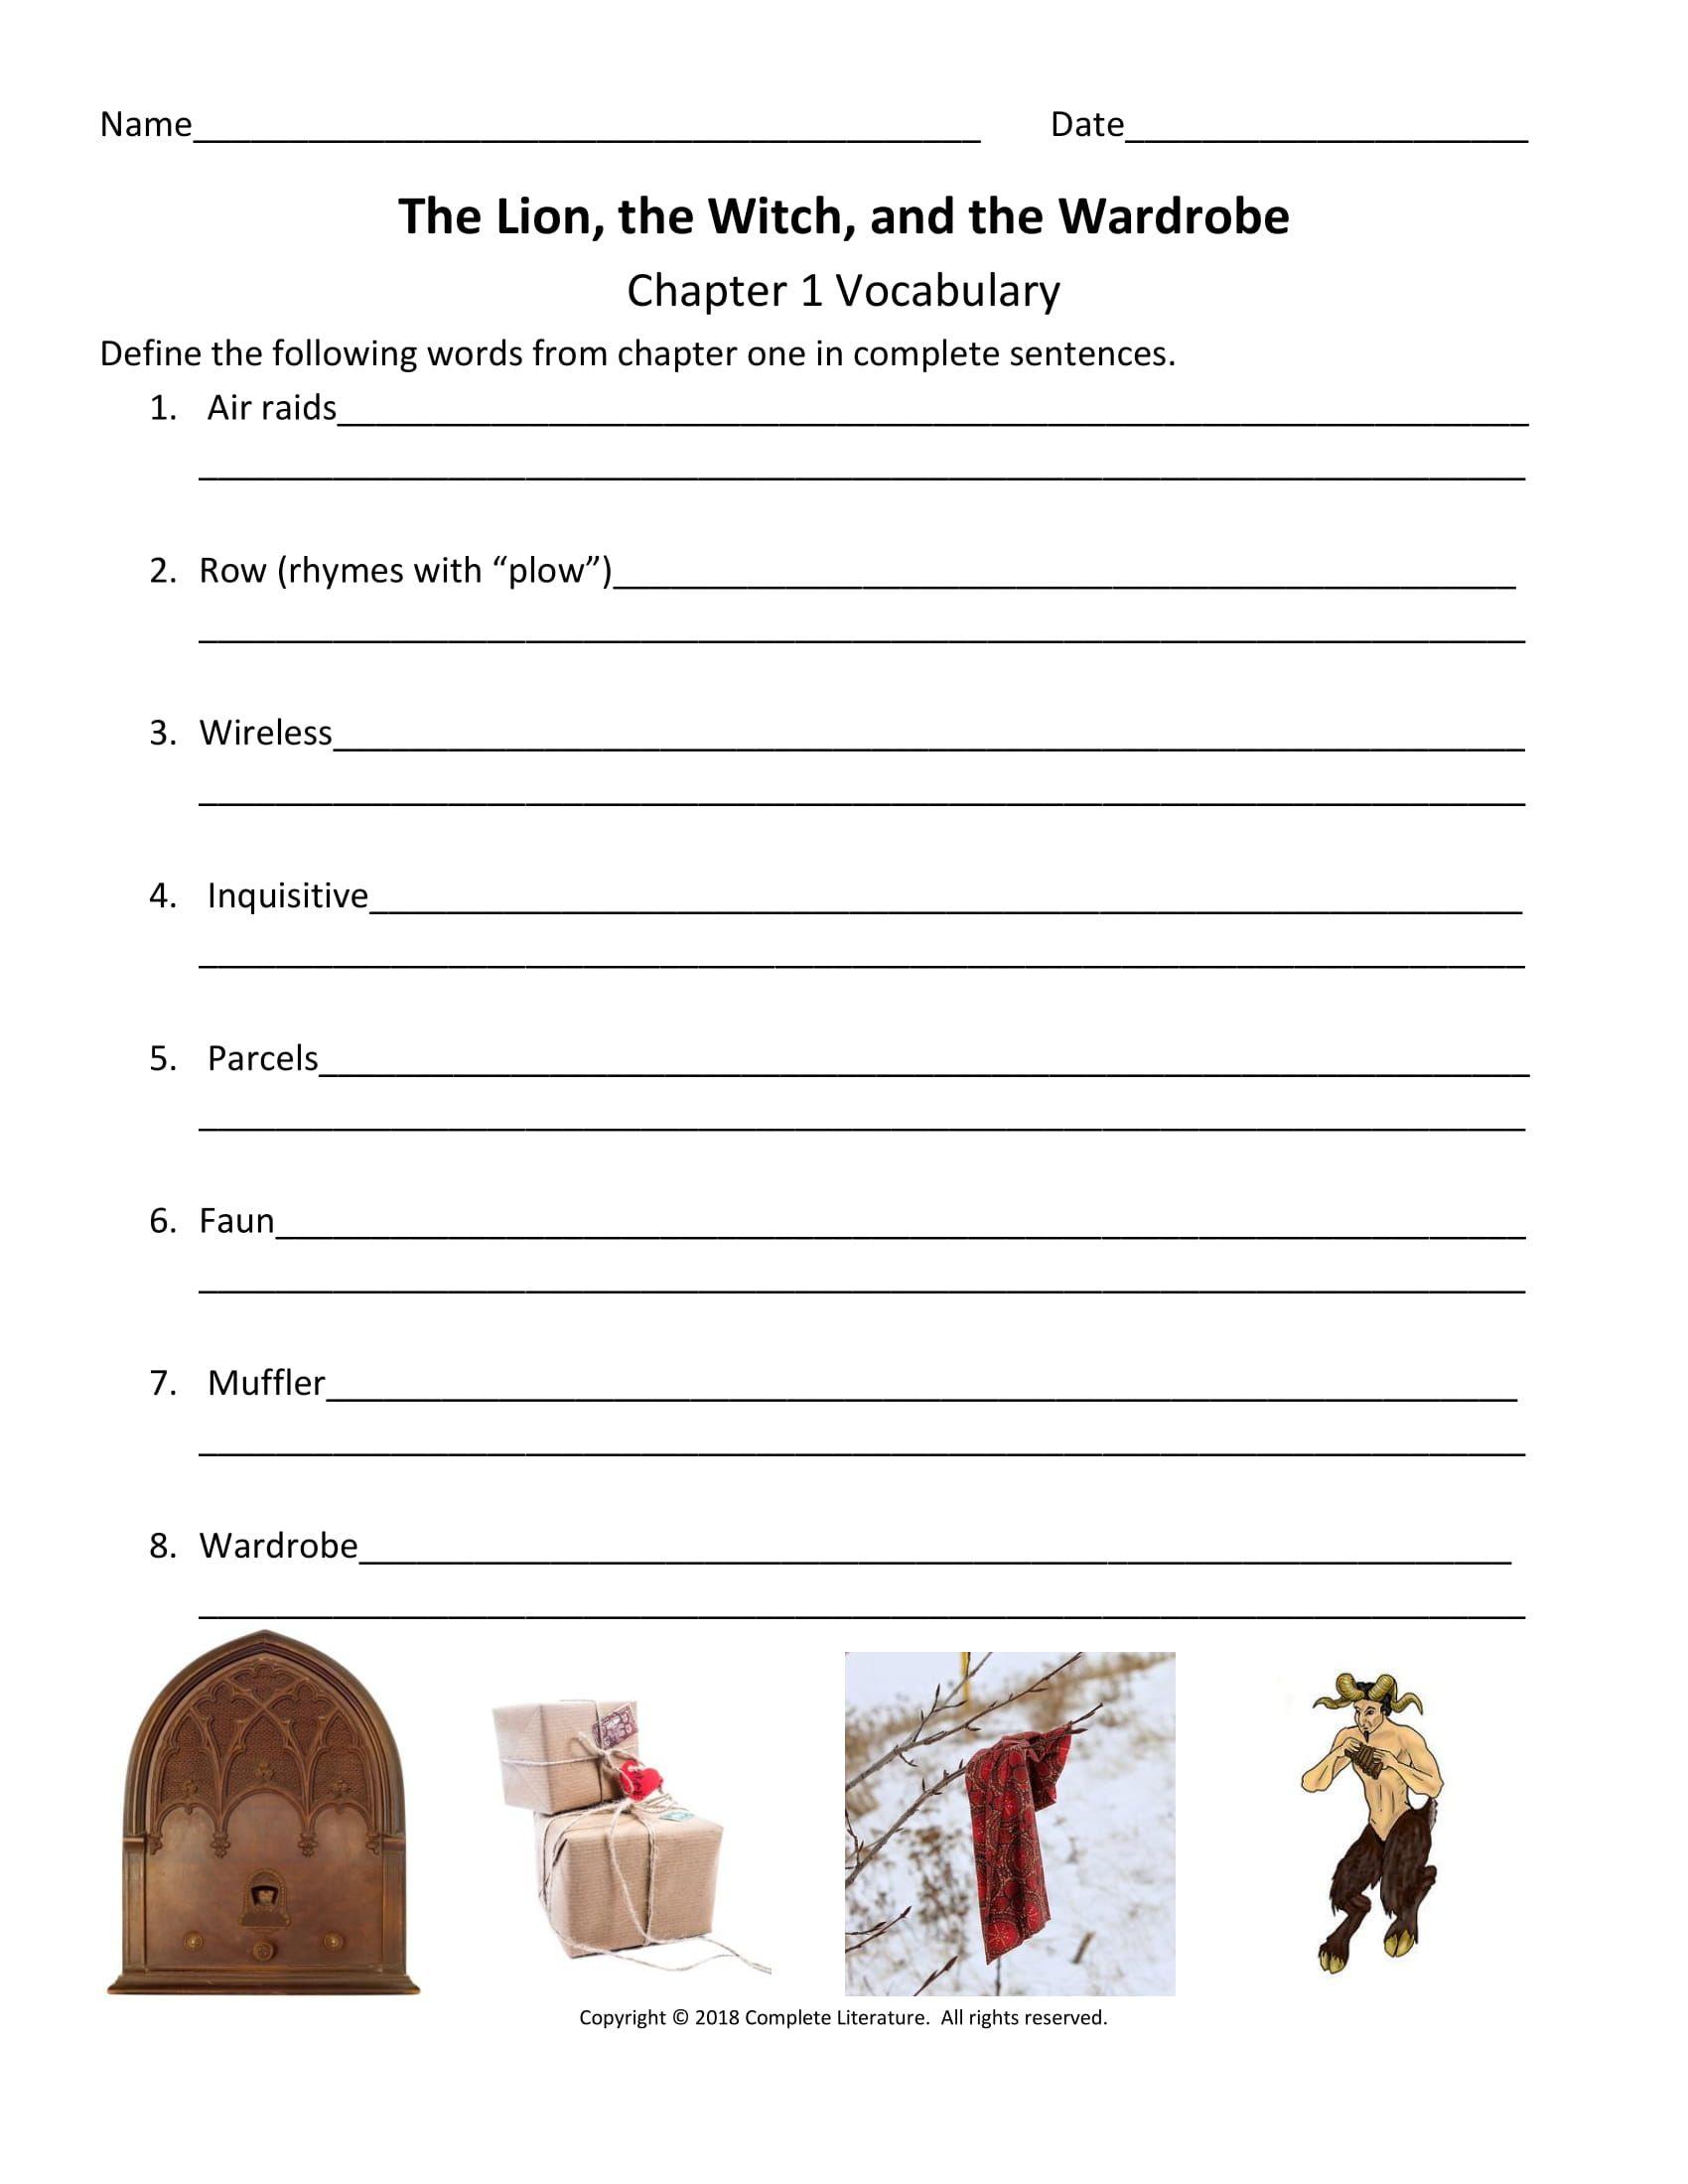 Narnia Vocabulary Worksheet